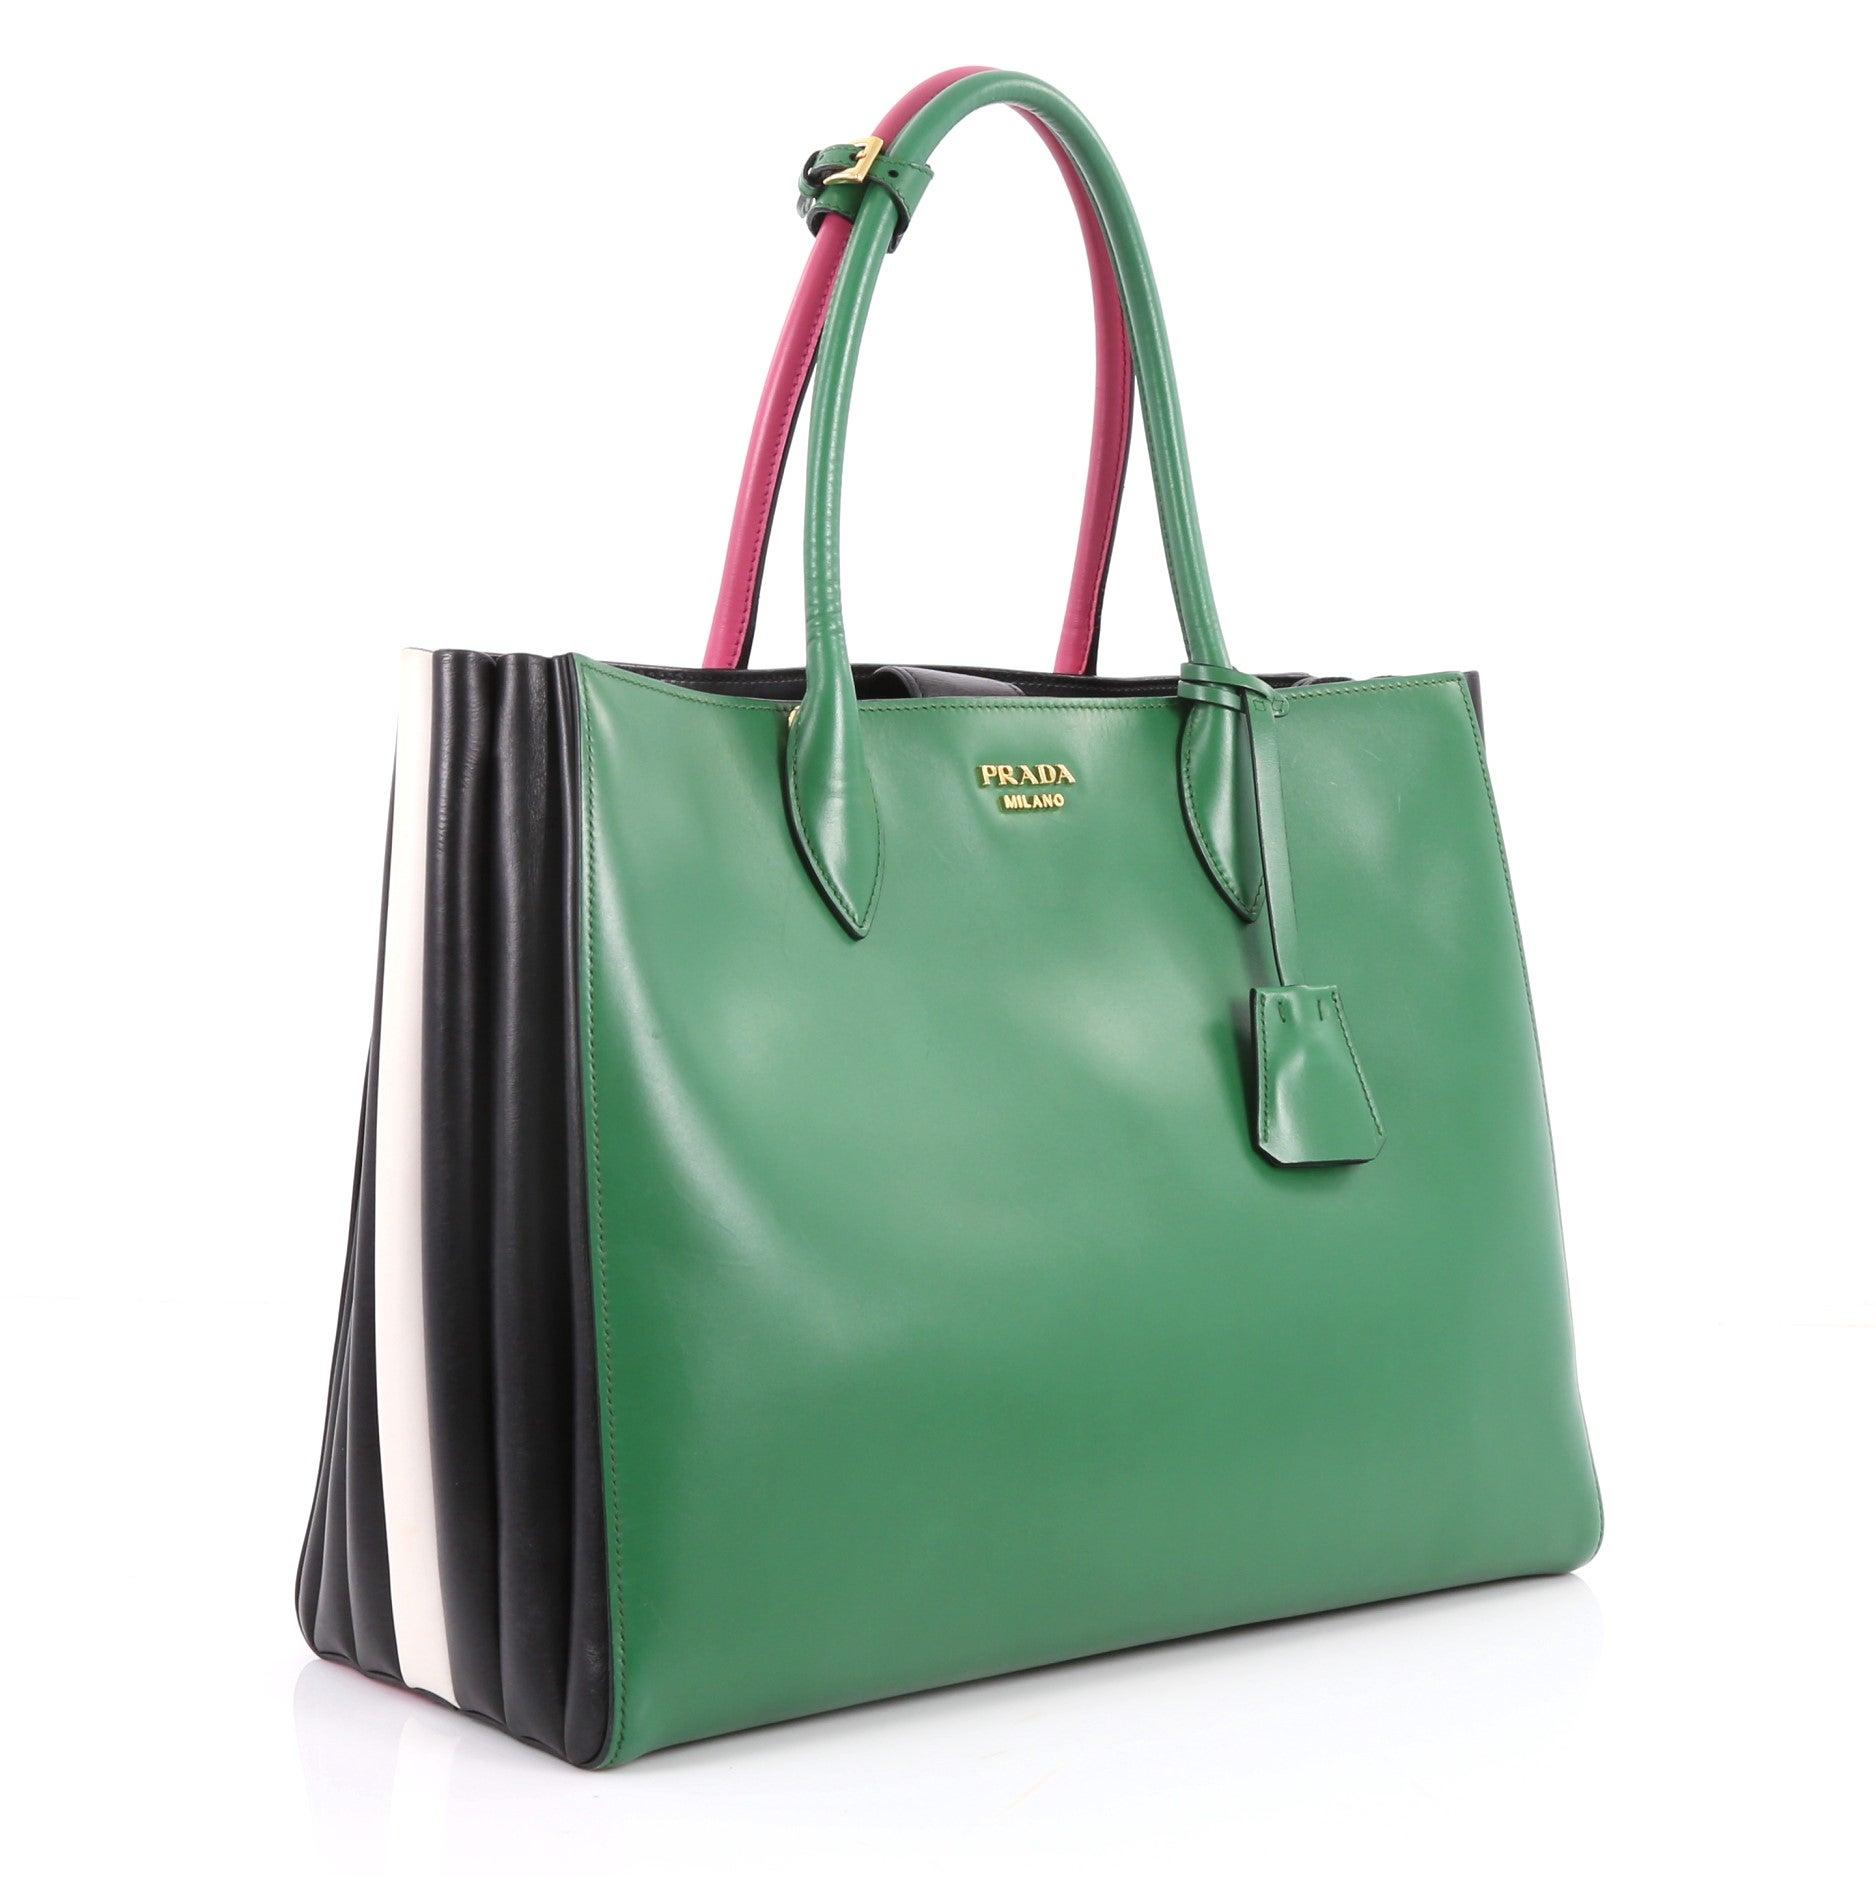 36956768ecce Prada Soft Bibliotheque Handbag City Calfskin Large at 1stdibs